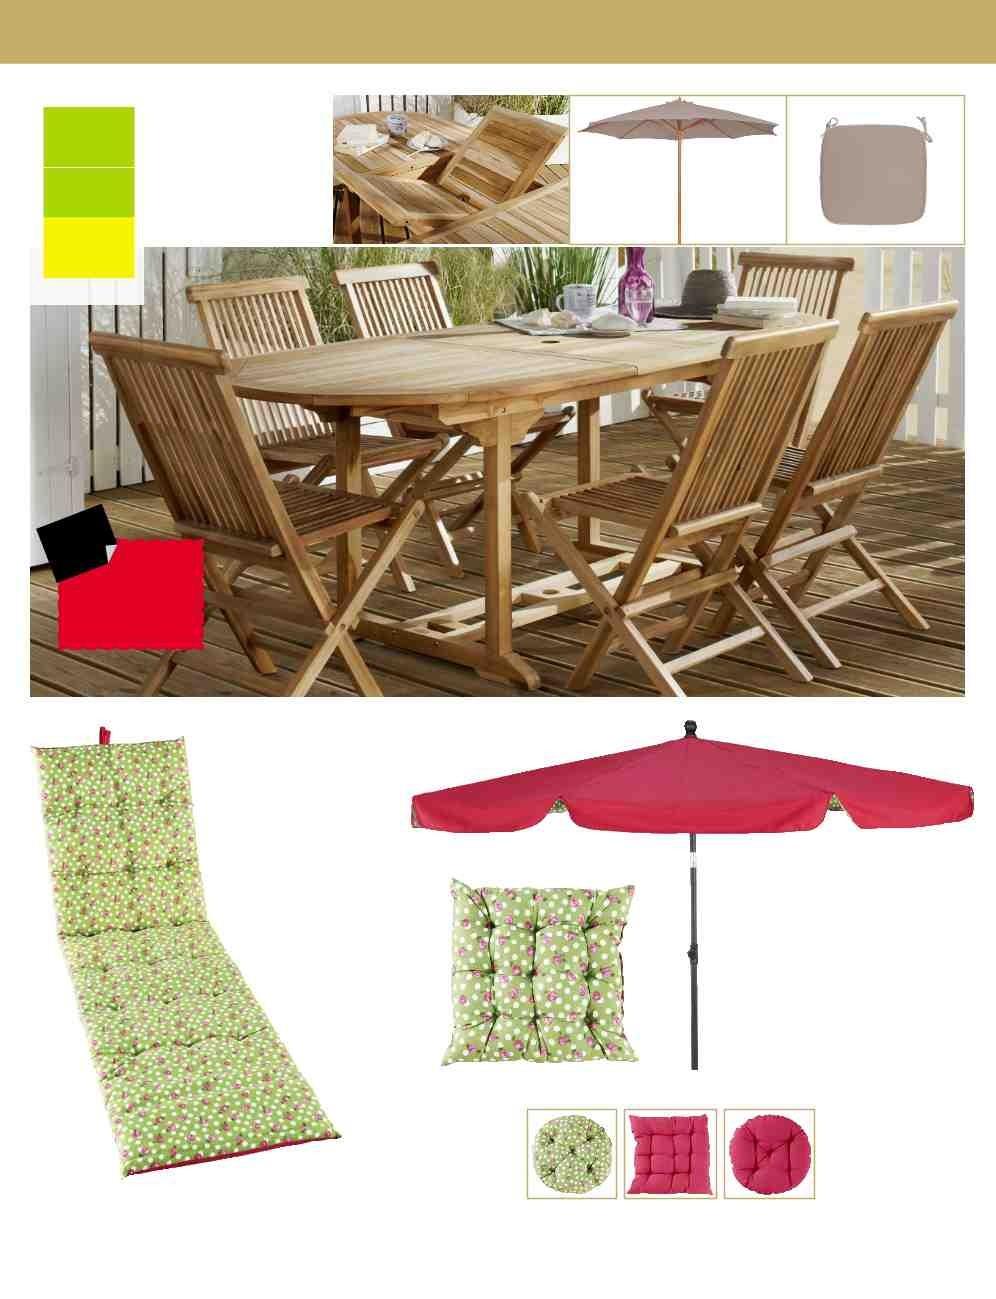 Mobilier De Jardin Intermarché 2016 - Mailleraye.fr Jardin concernant Intermarché Table De Jardin